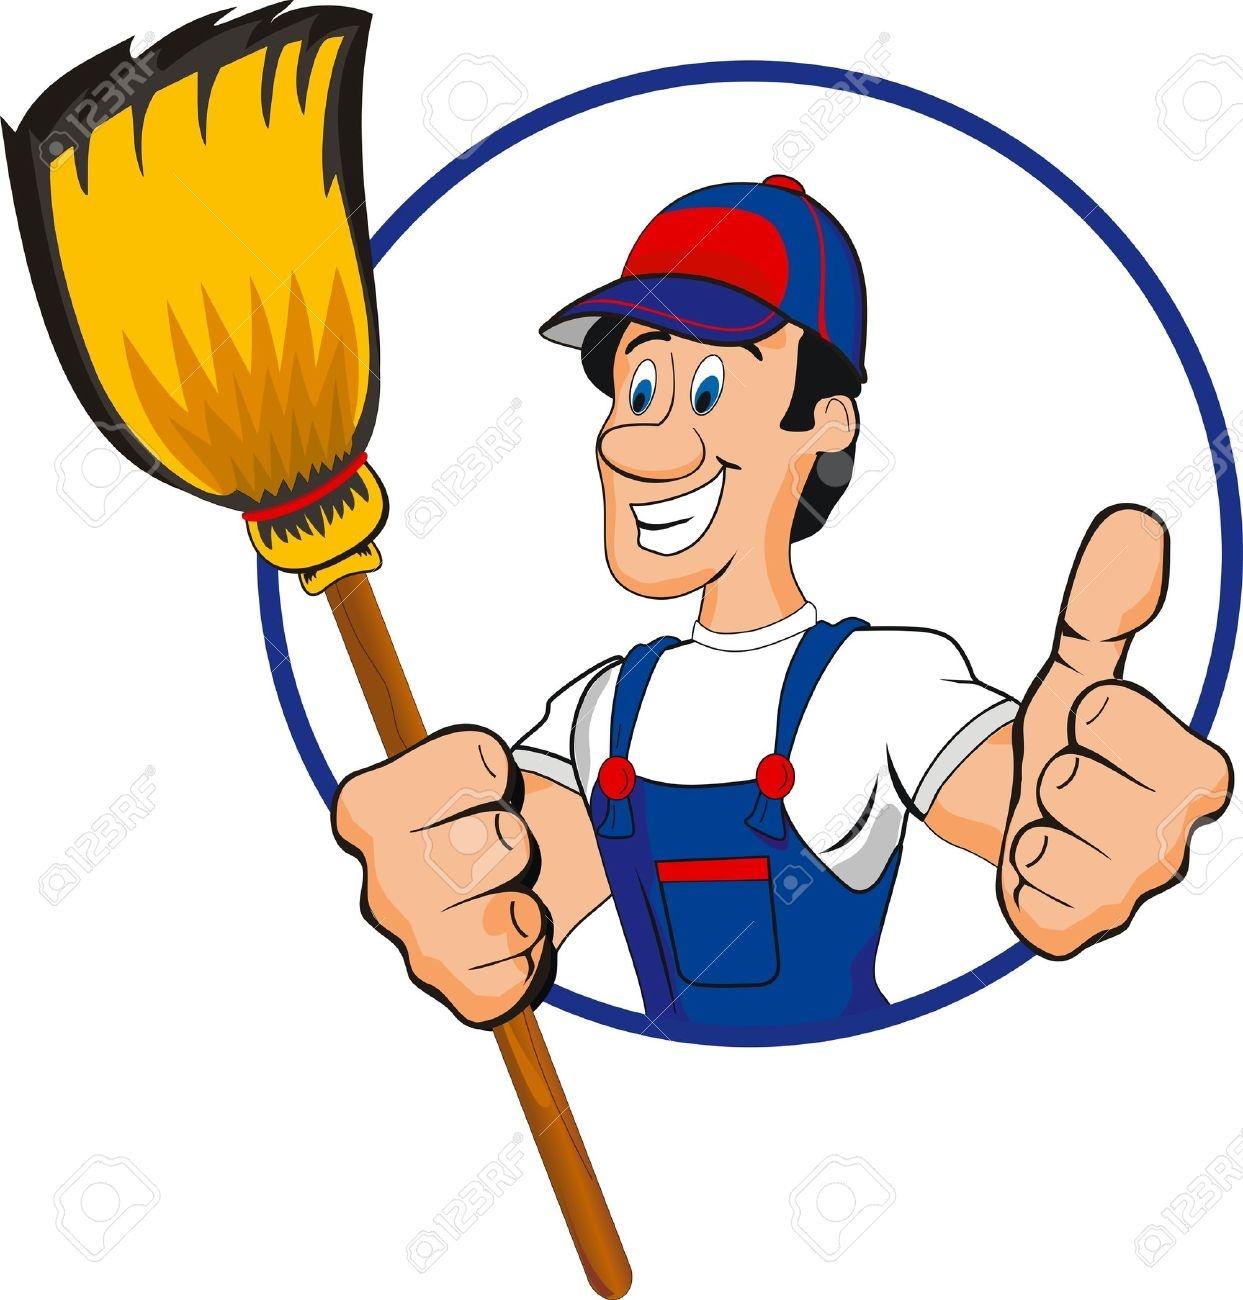 Housekeeping clipart cartoon. Free download best